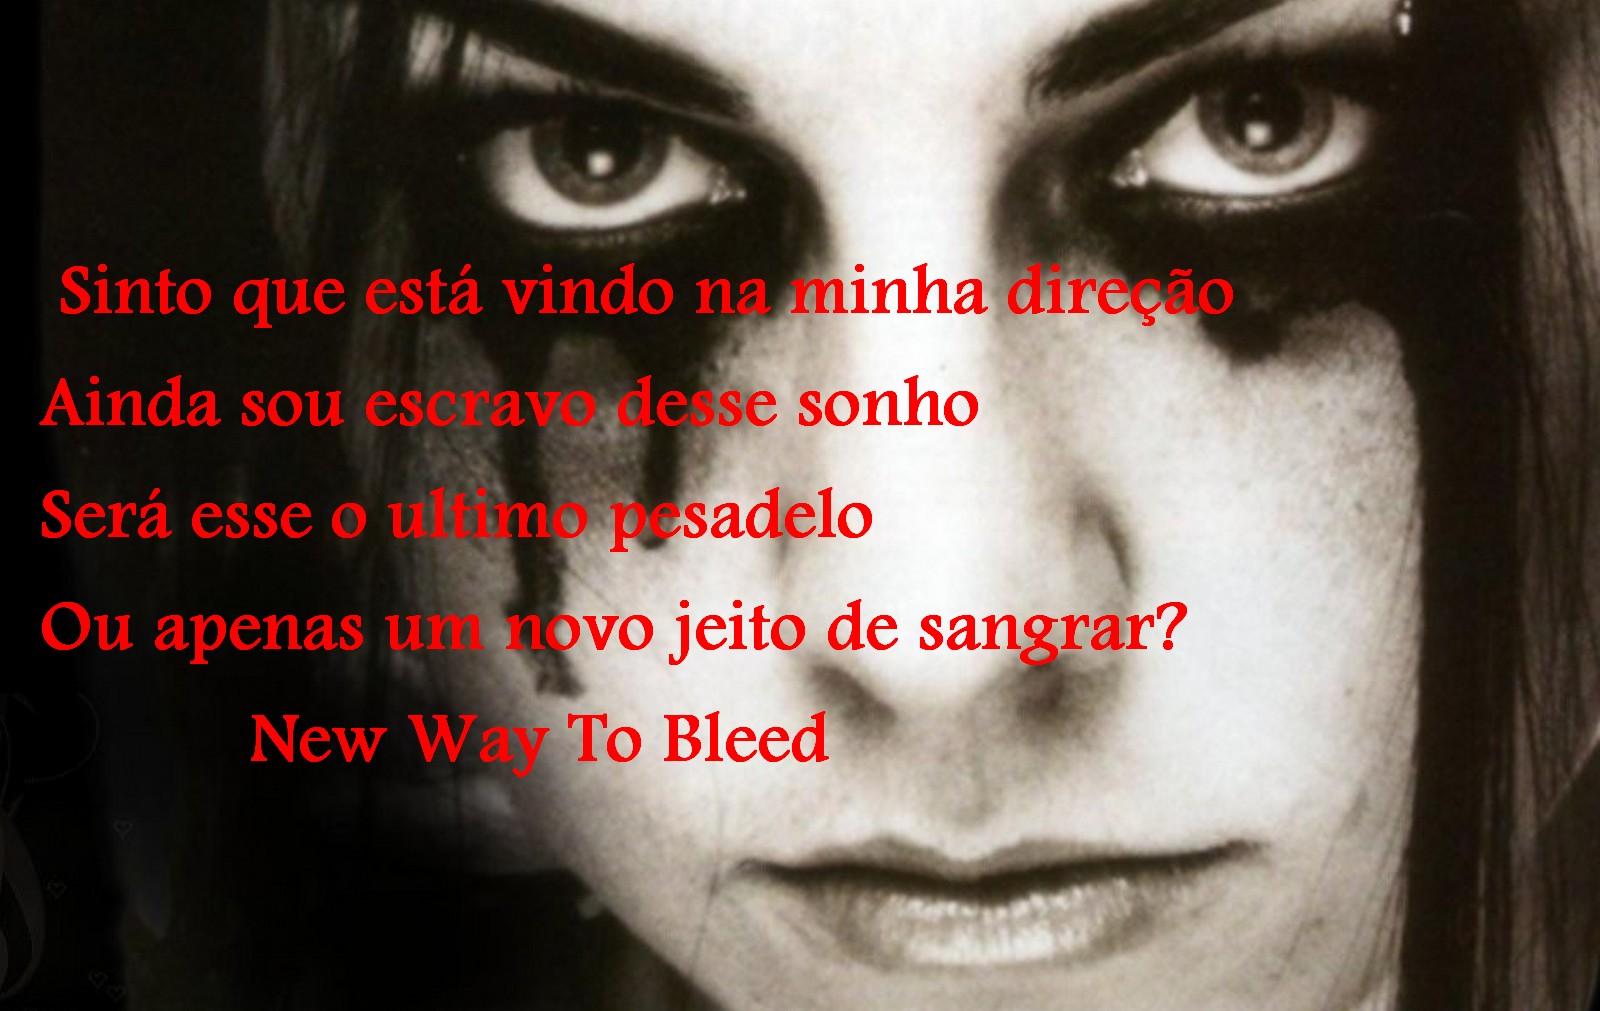 http://4.bp.blogspot.com/-o590wH2R-lY/ULkdM03cAjI/AAAAAAAAEZQ/clnowzgkEVs/s1600/Evanescence-Amy-Lee-closeup-Wallpaper-.jpg